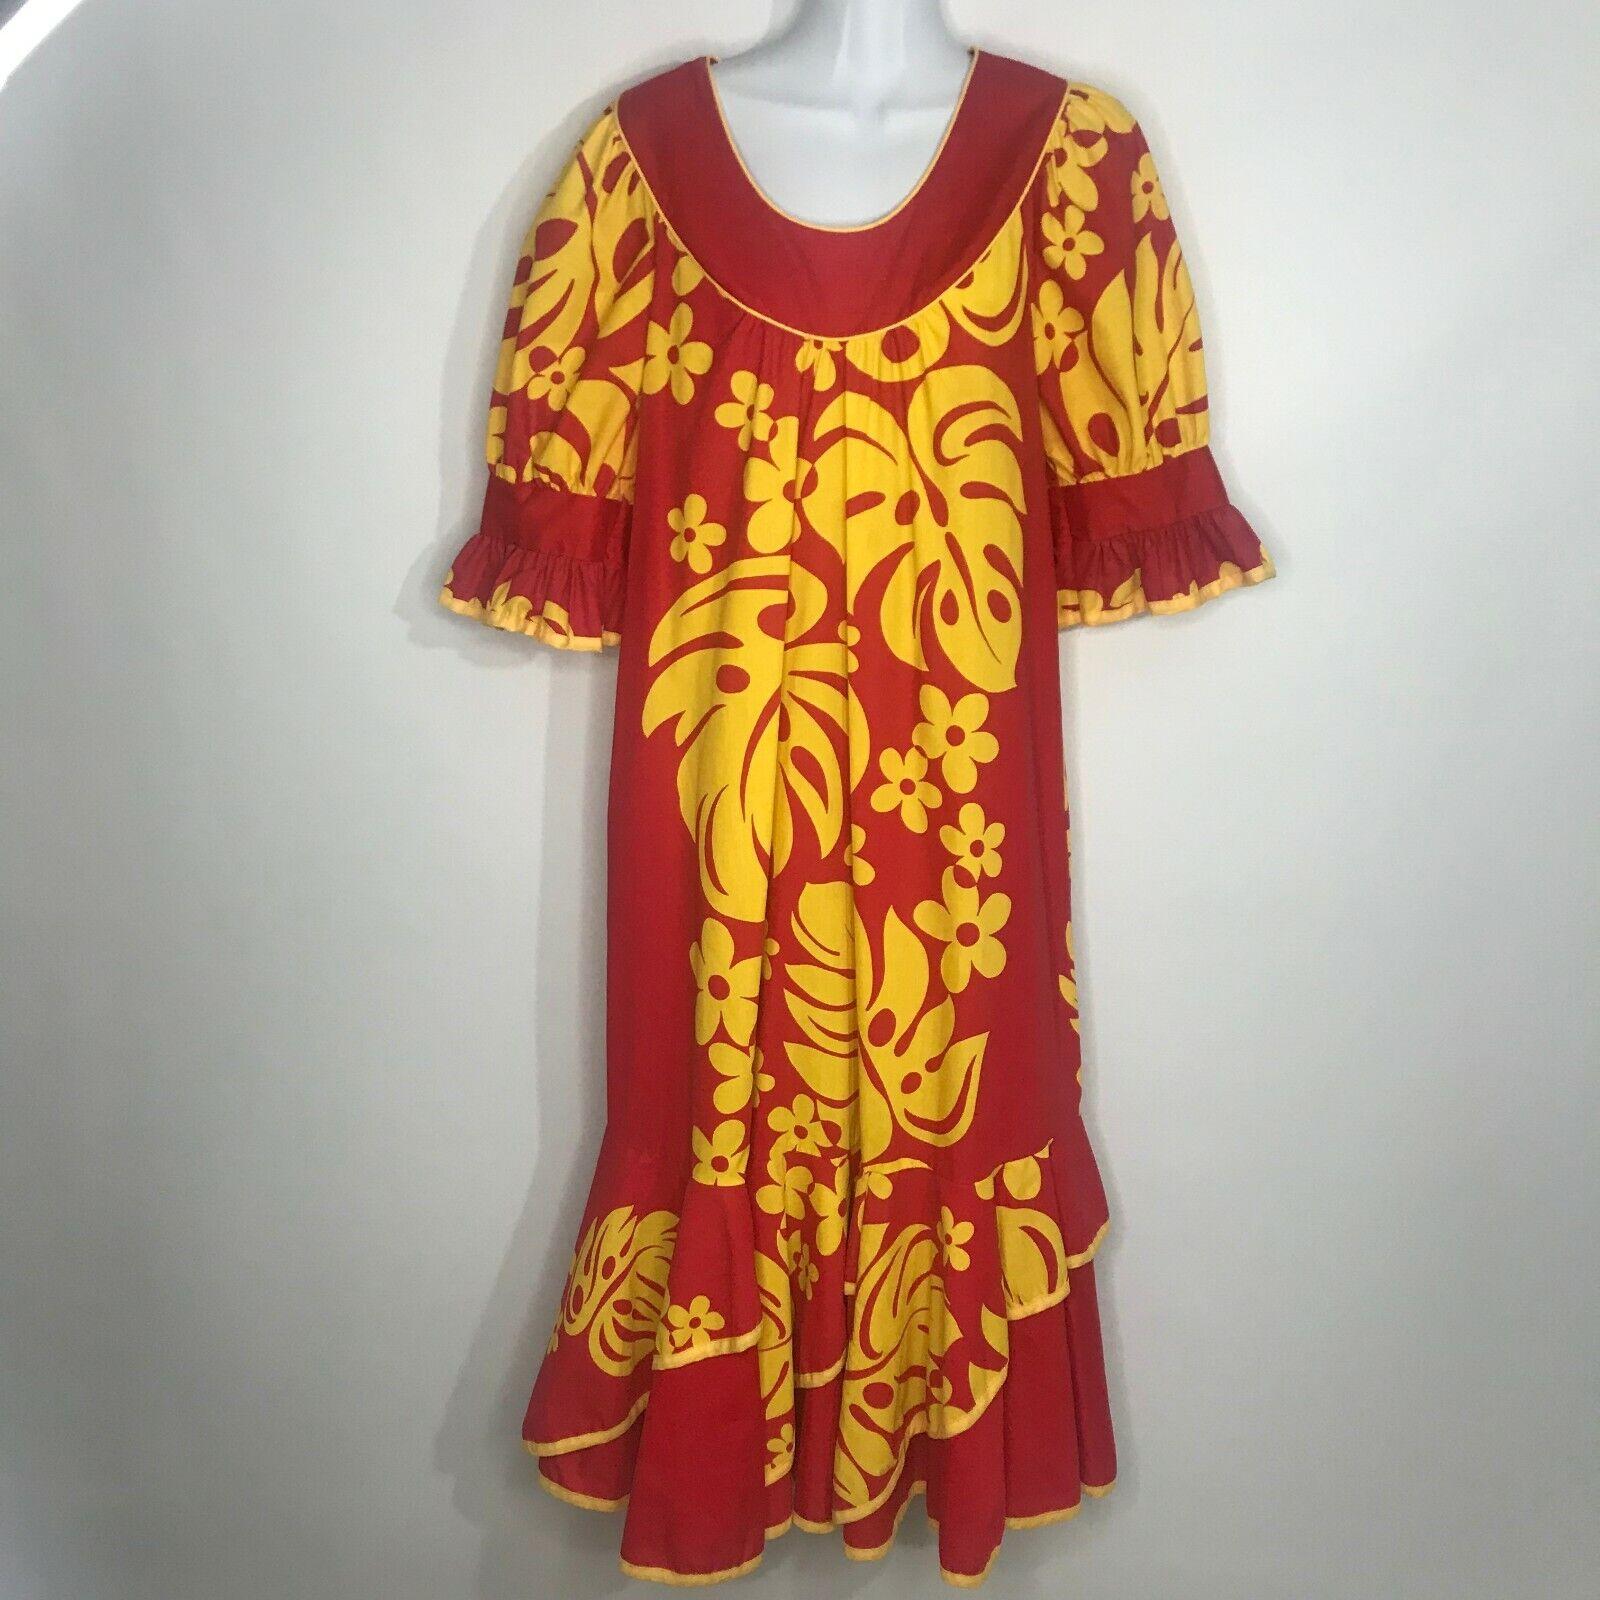 Winnie Fashions Hawaiian Muumuu Muu Muu M BRIGHT rot Gelb Floral Aloha USA